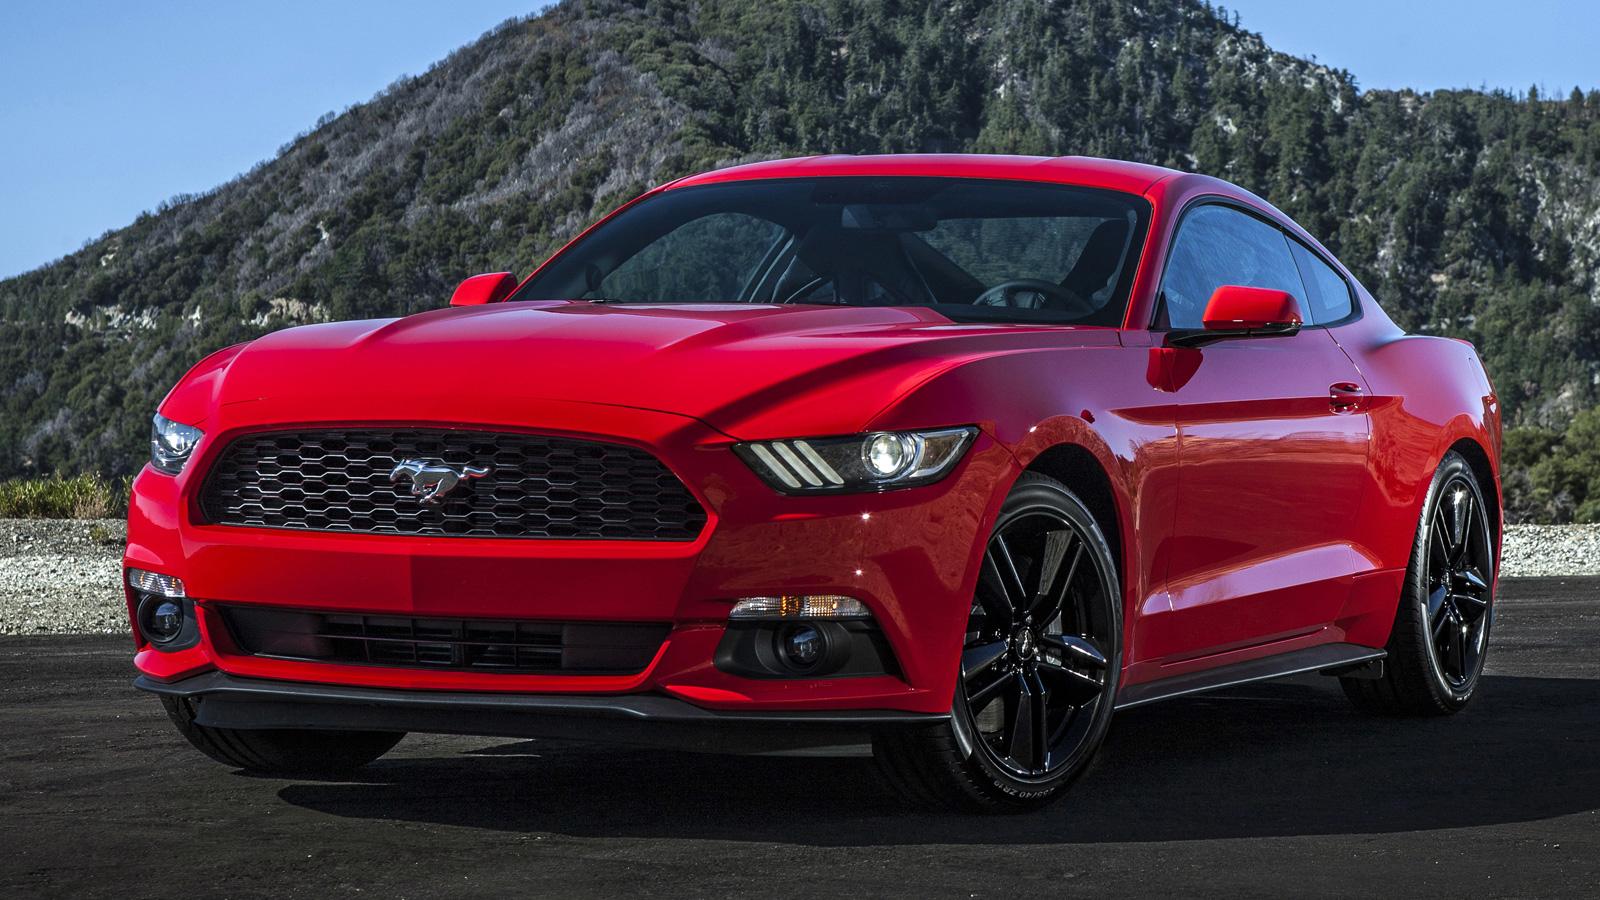 2018 Mustang Mach 1 >> Ford Mustang (2018-2019) цены и характеристики, фотографии и обзор